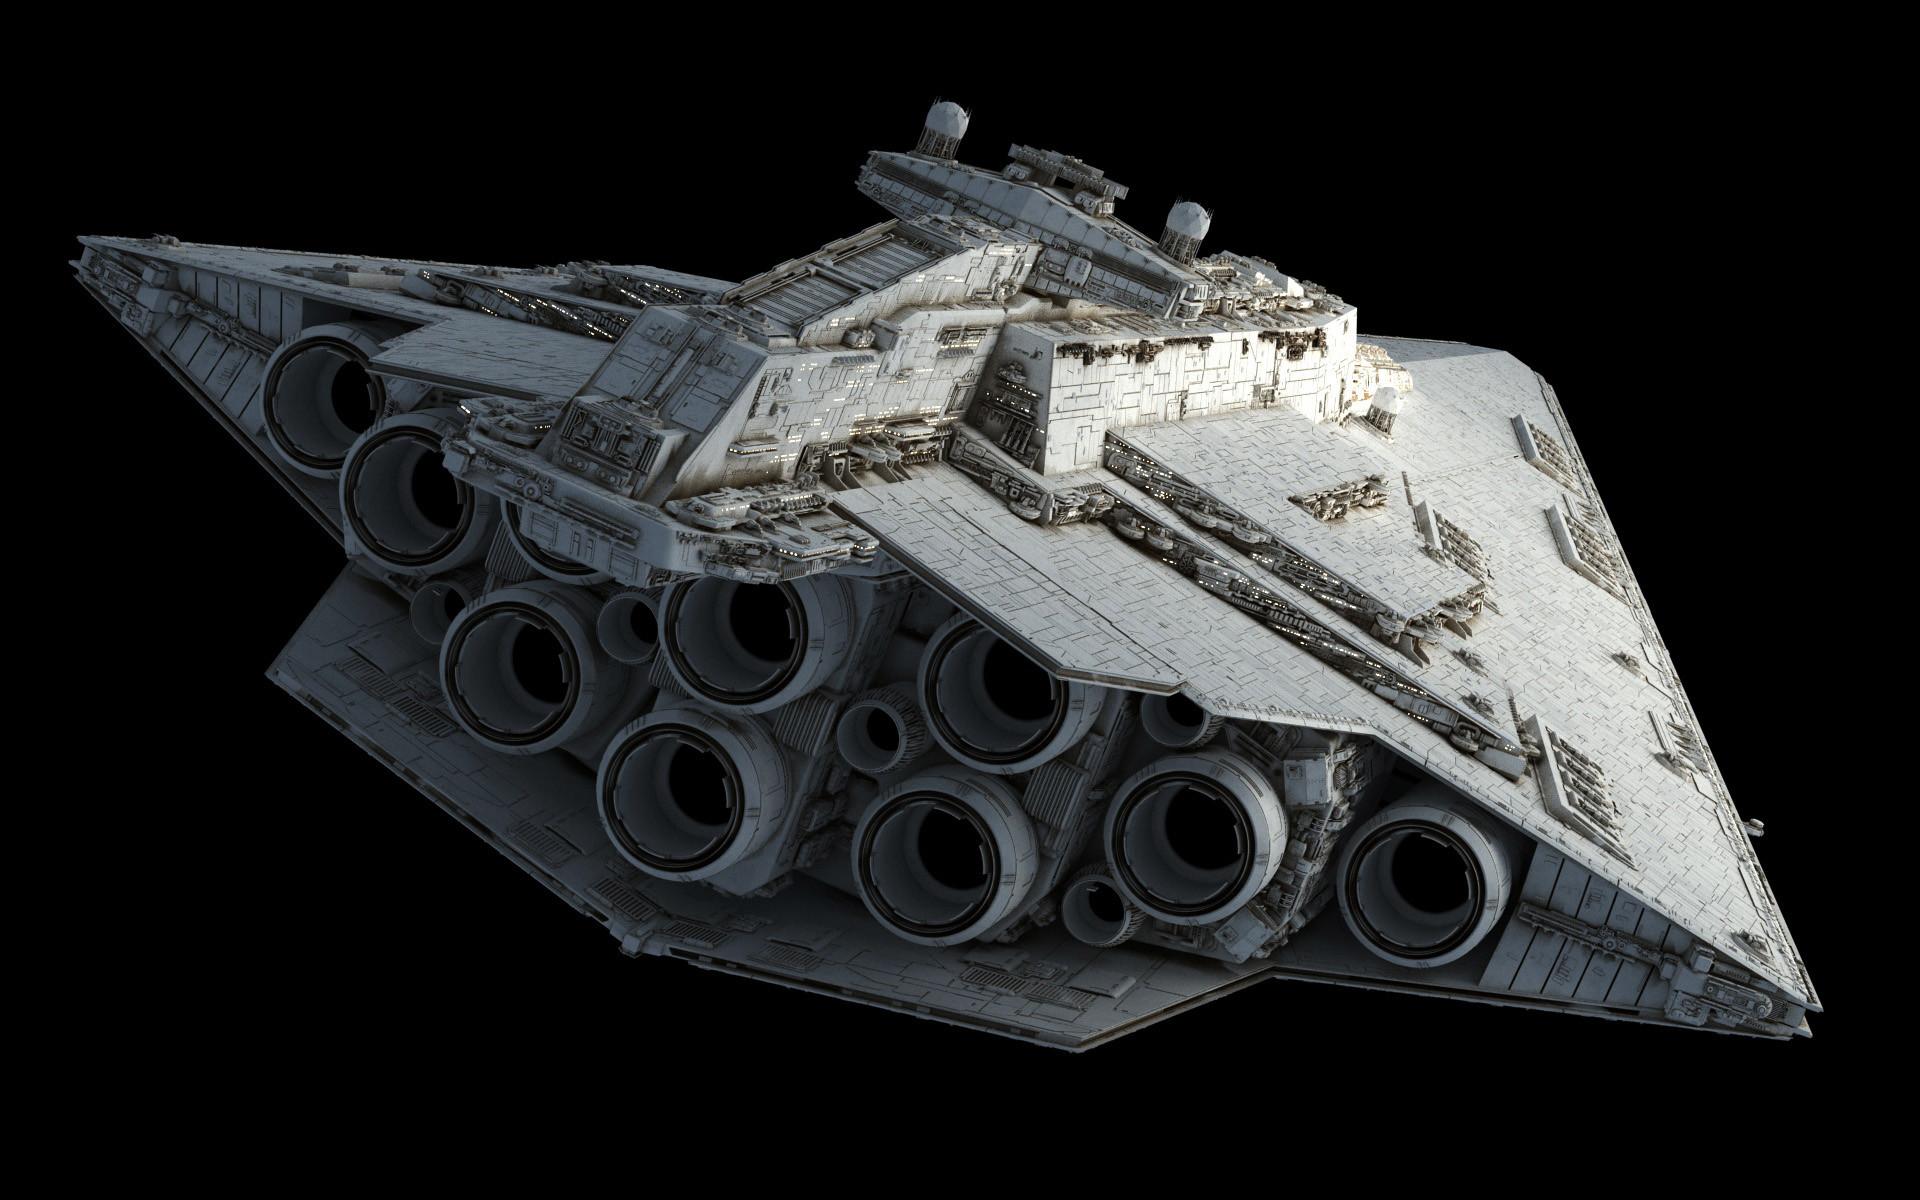 Ansel hsiao cruiser16